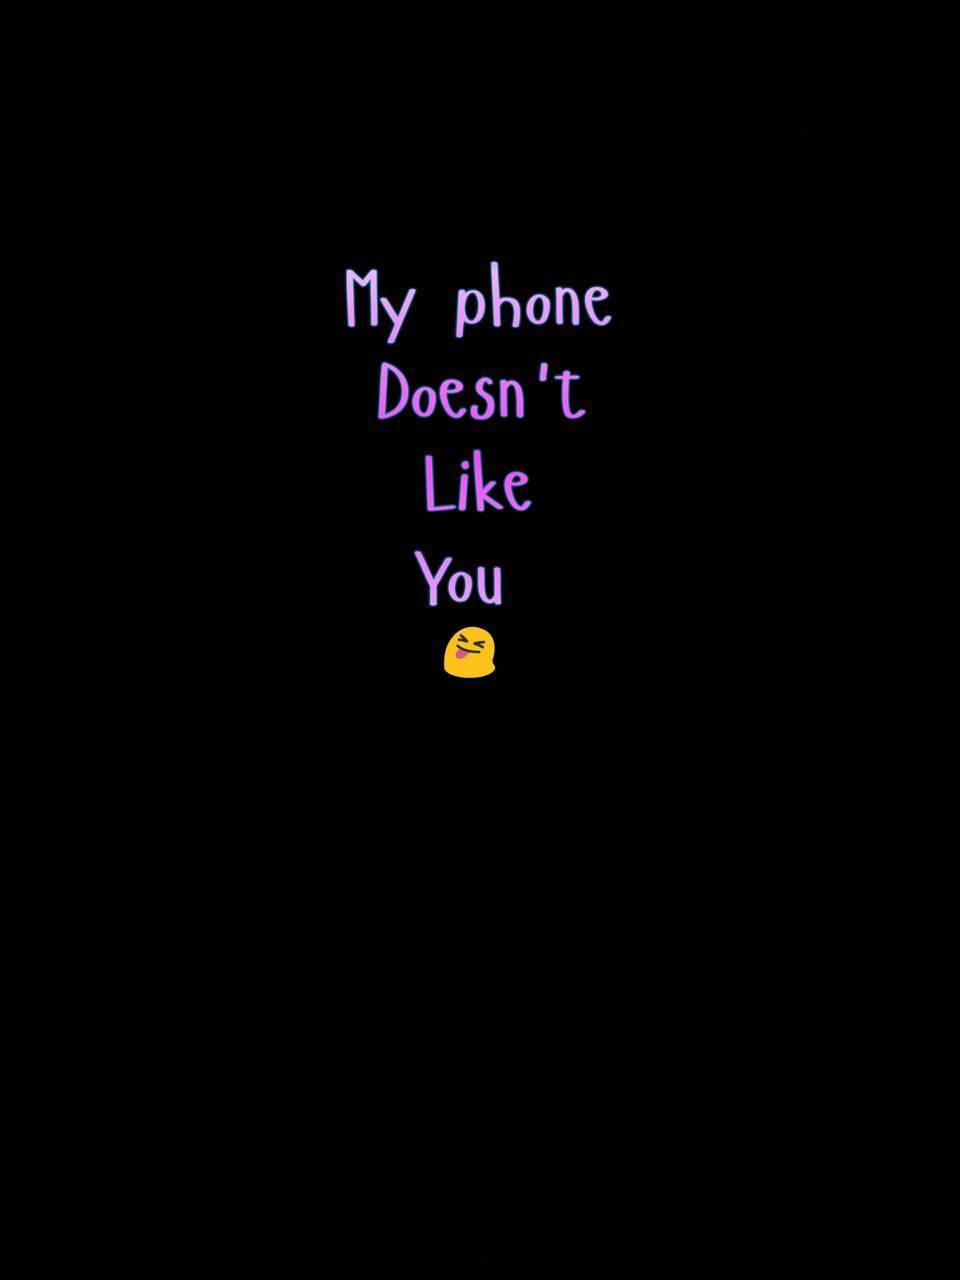 Phone lock